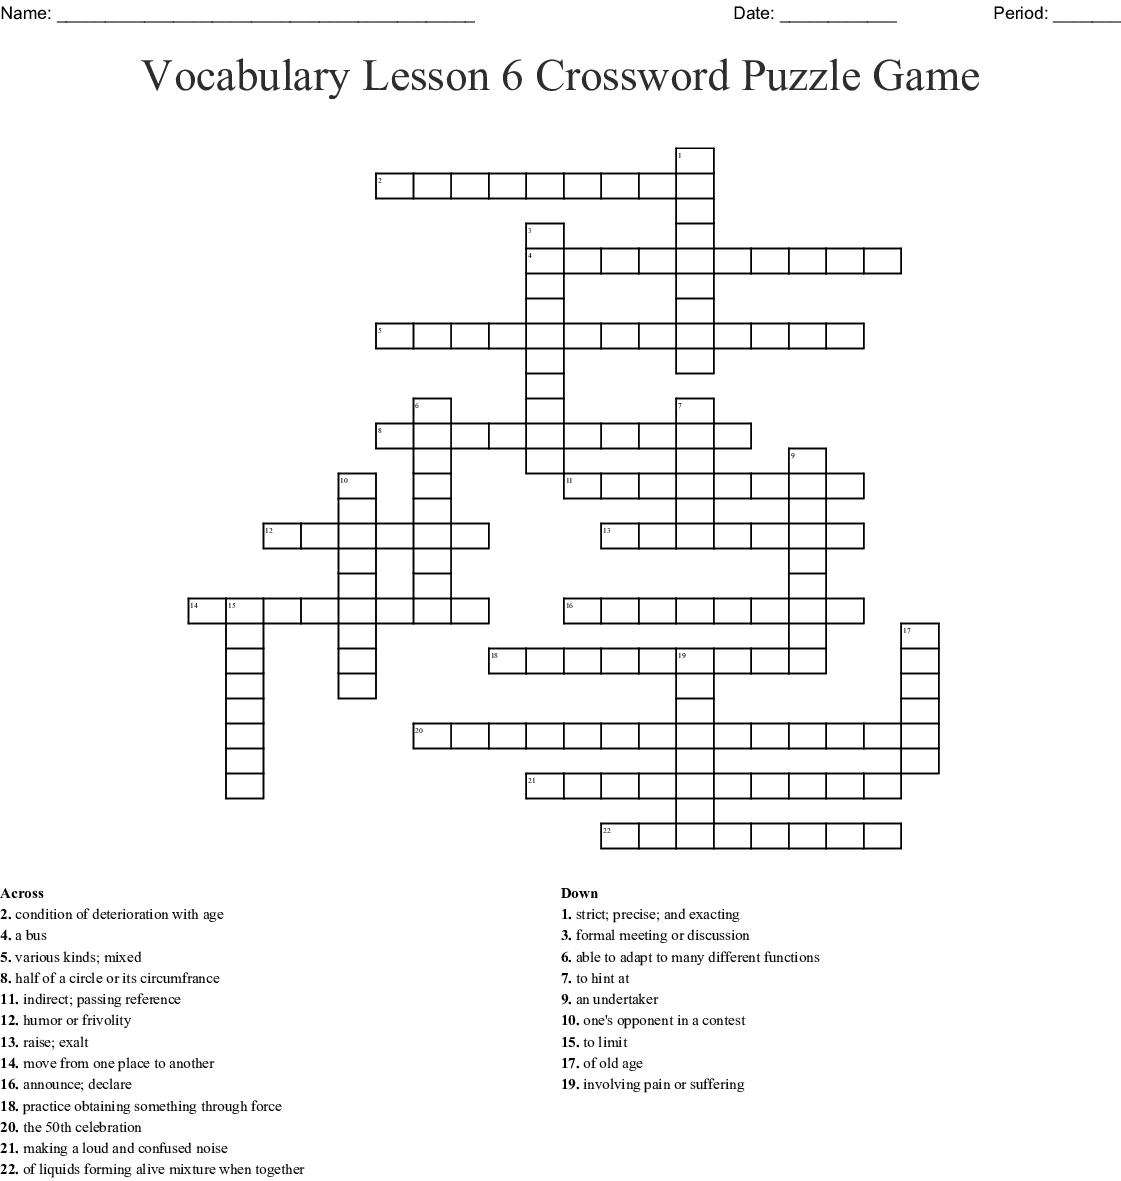 Vocabulary Lesson 6 Crossword Puzzle Game Wordmint